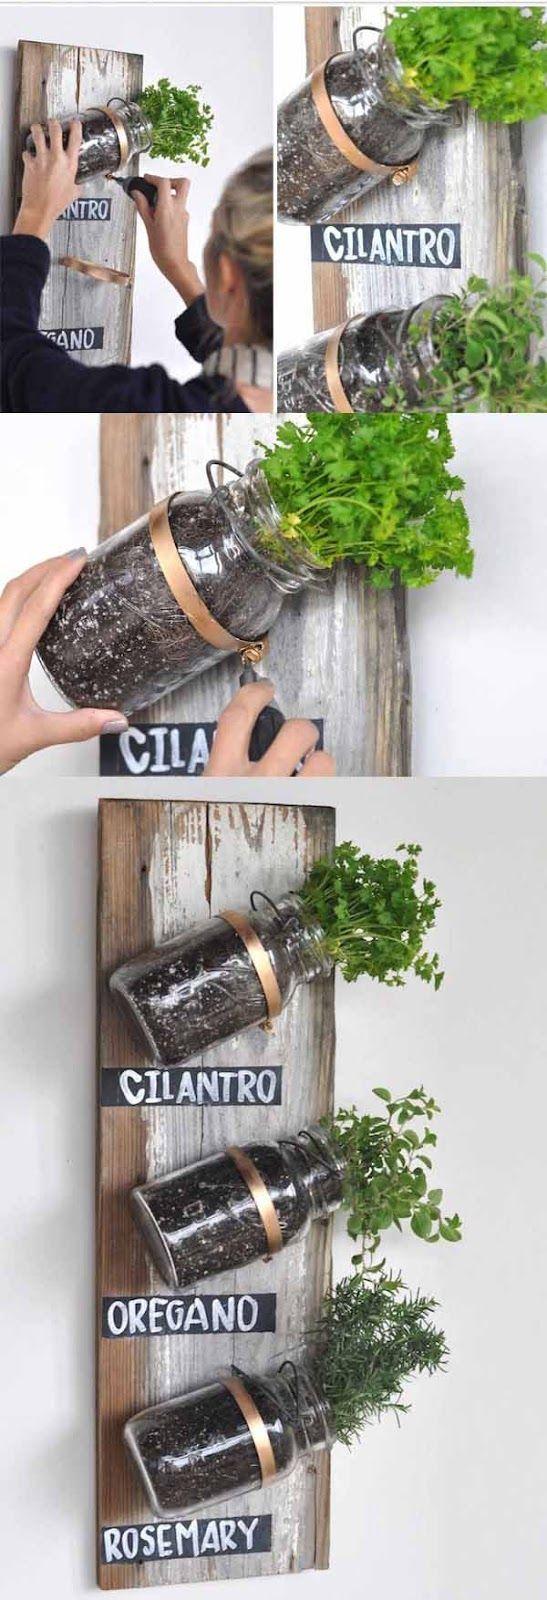 Great garden idea using mason jars